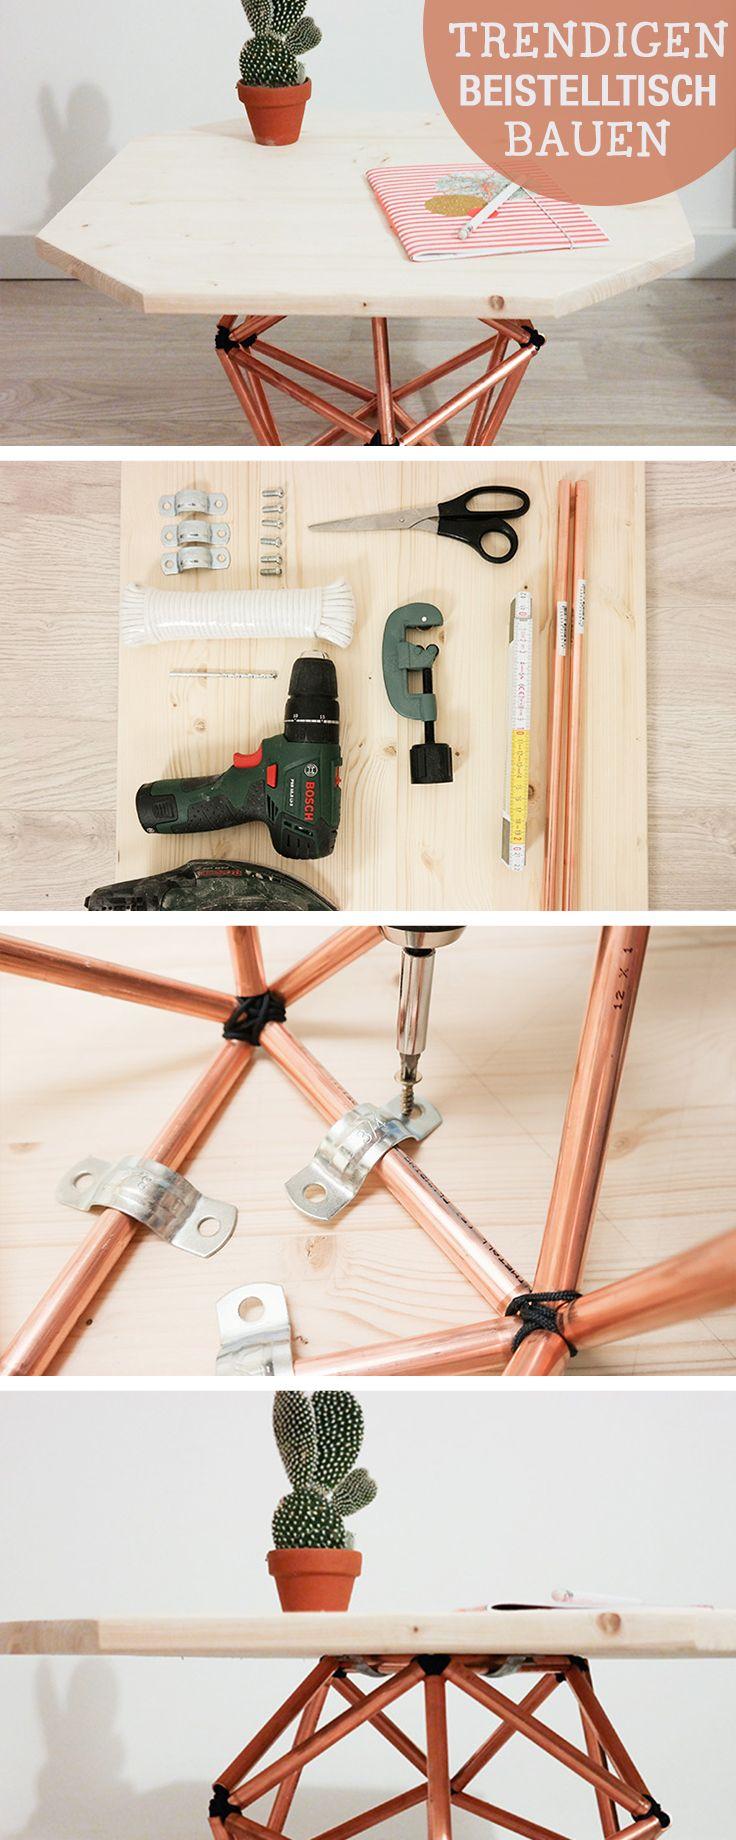 DIY- Anleitung: Couchtisch aus Kupferrohren bauen, Industriedesign / diy tutorial: table with copper pipes, industrial design via DaWanda.com